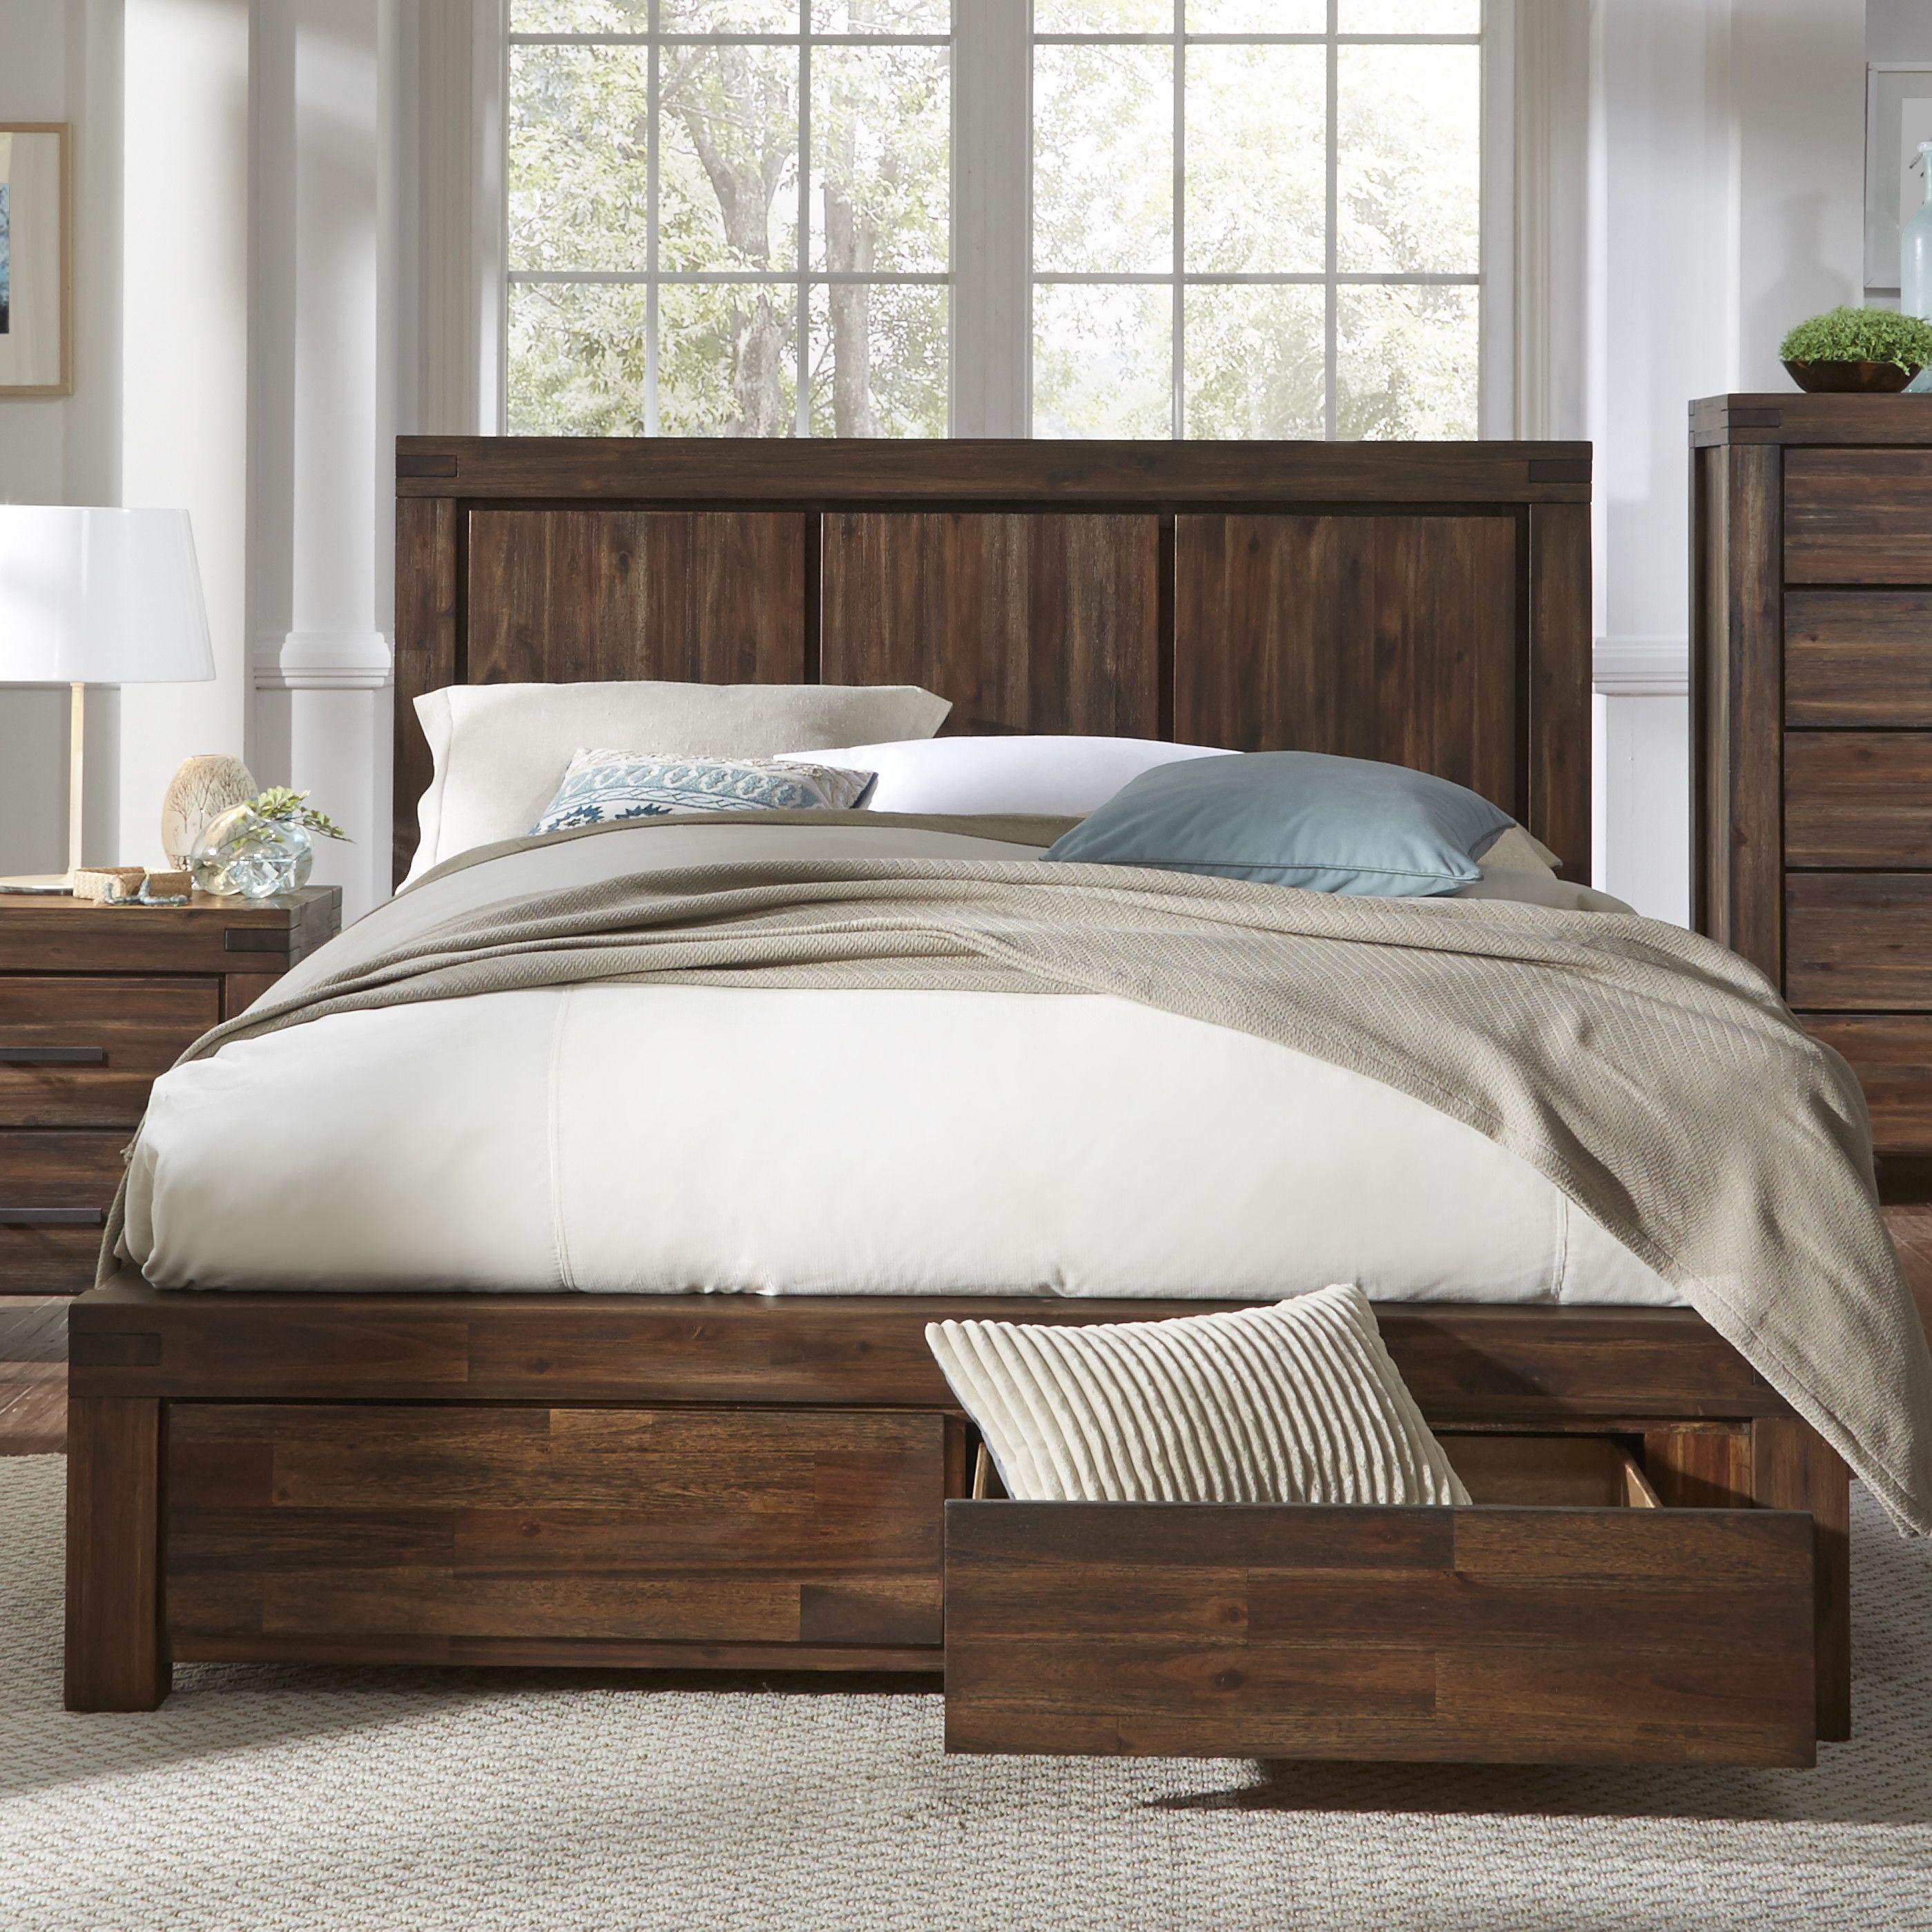 Loon Peak® Palo Alto Storage Panel Bed Modus furniture